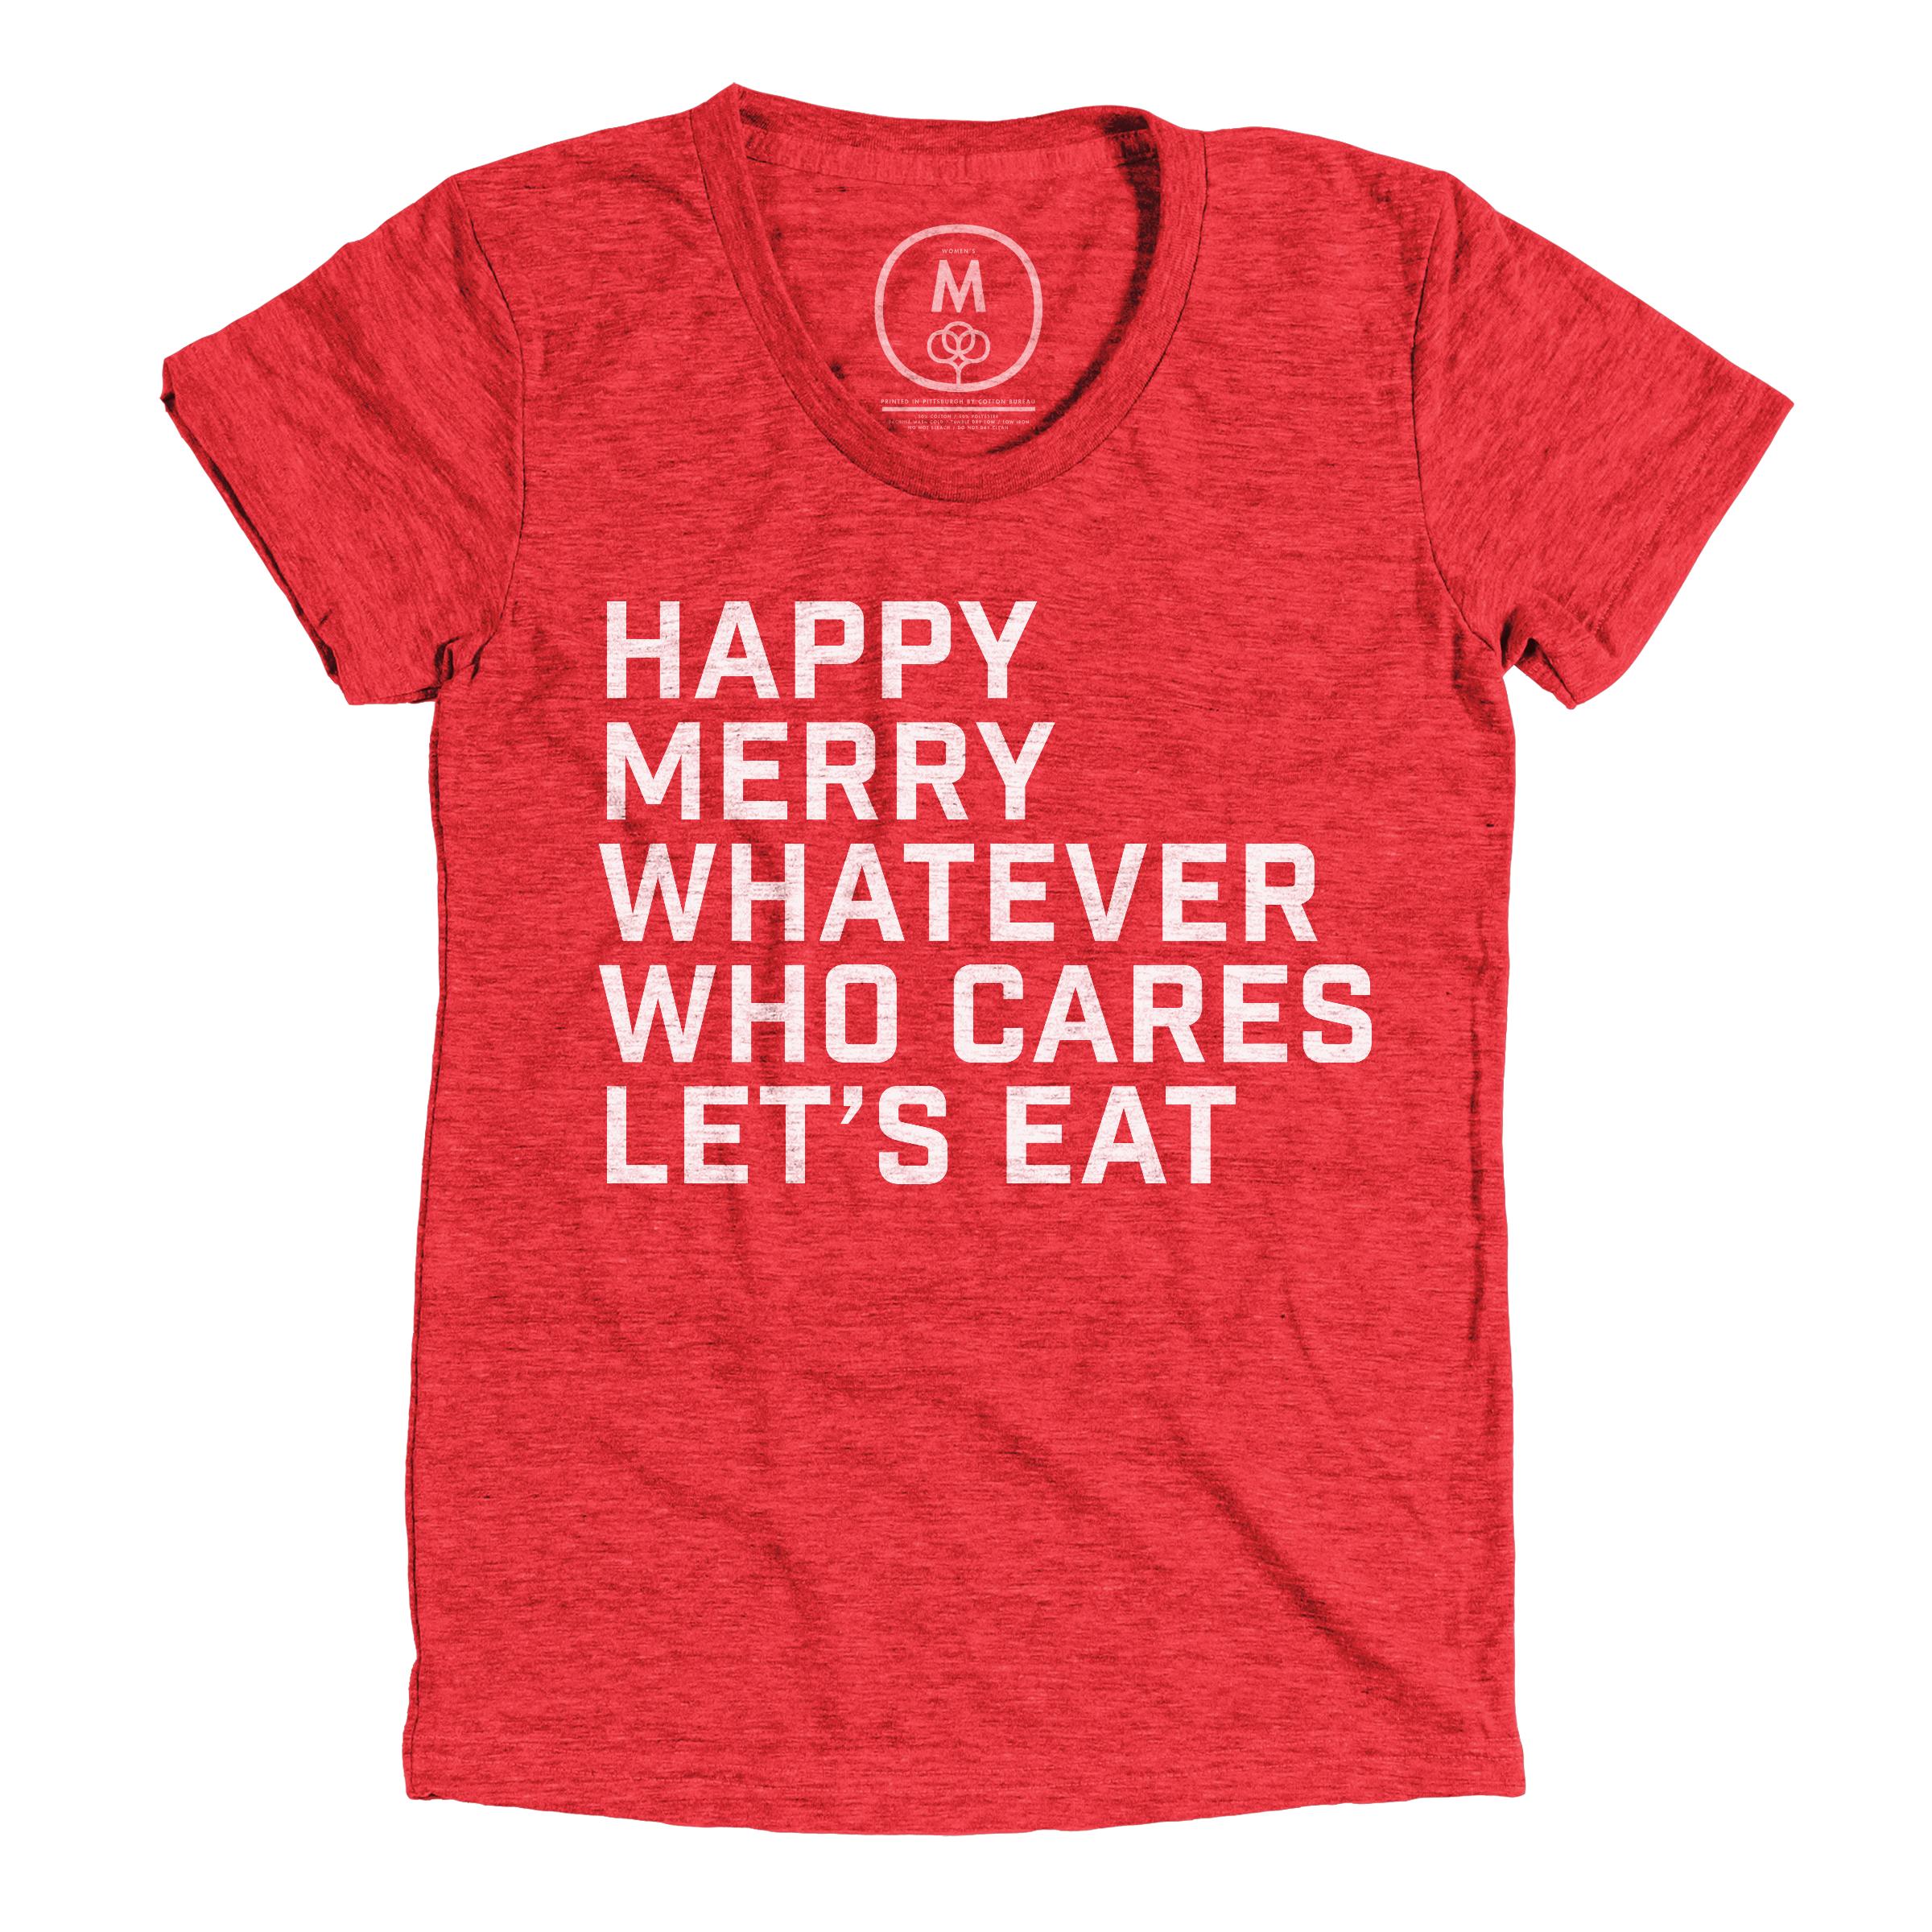 Let's Eat Vintage Red (Women's)